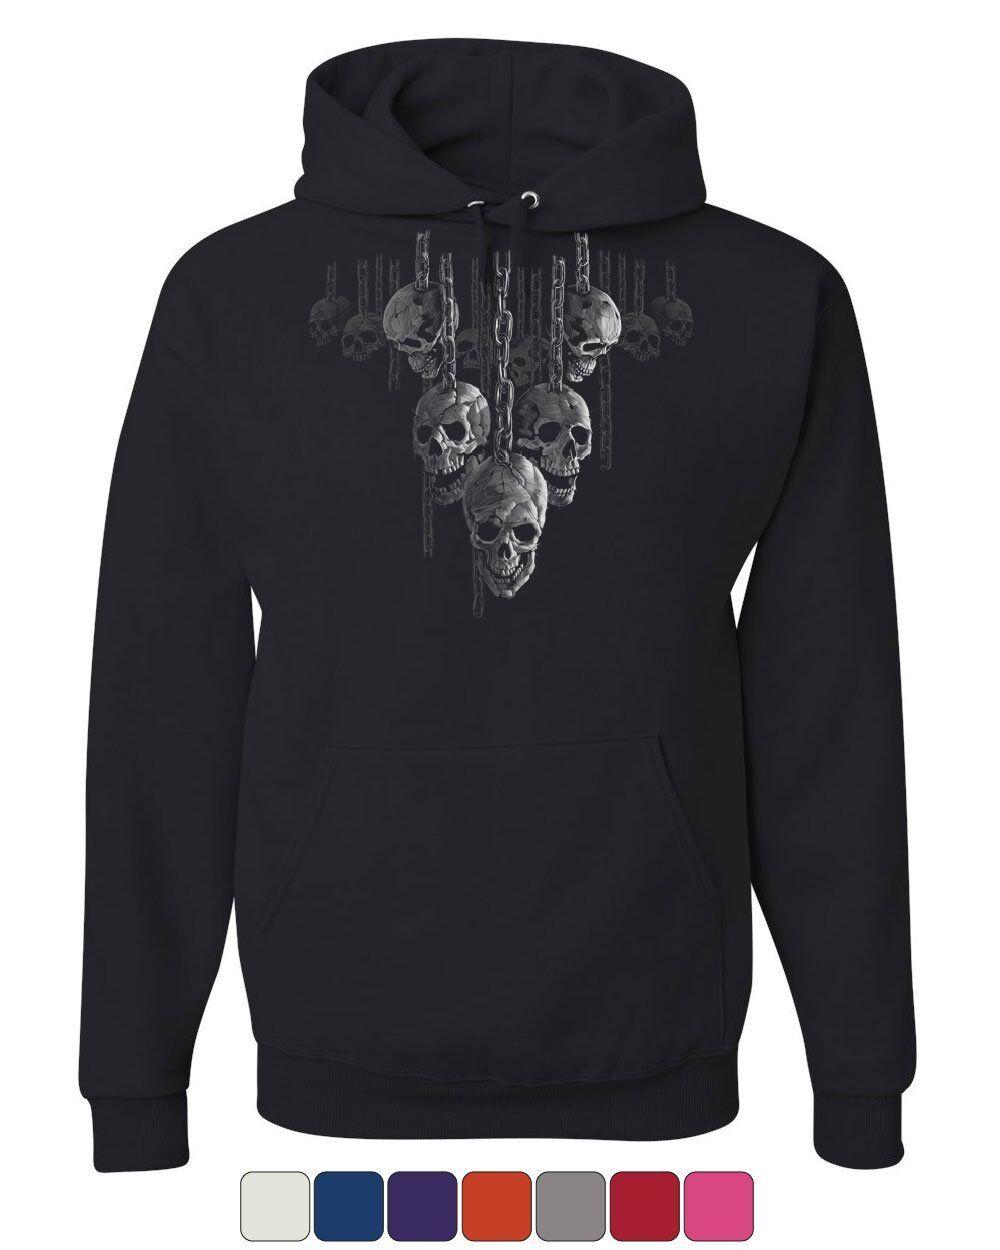 Skulls Hanging on Chains Hoodie Death Creepy Scary Hell Devil Sweatshirt